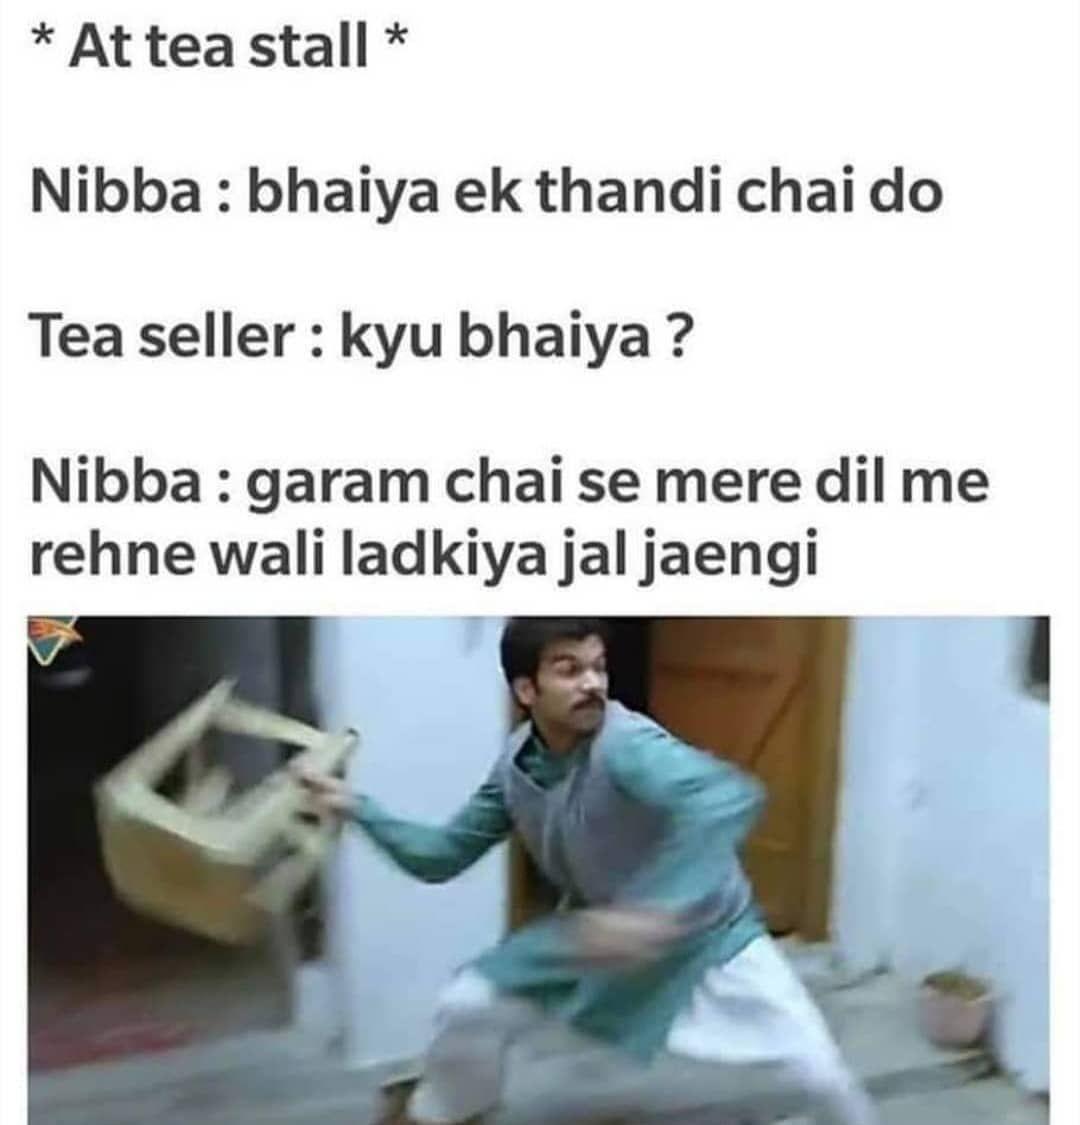 Nibba Delhi Memes Wala Delhi India Memes Meme Memeslover Comedy Jokes Fun Memepage Like Likeforlikes Tea Sellers Insta Posts Jokes